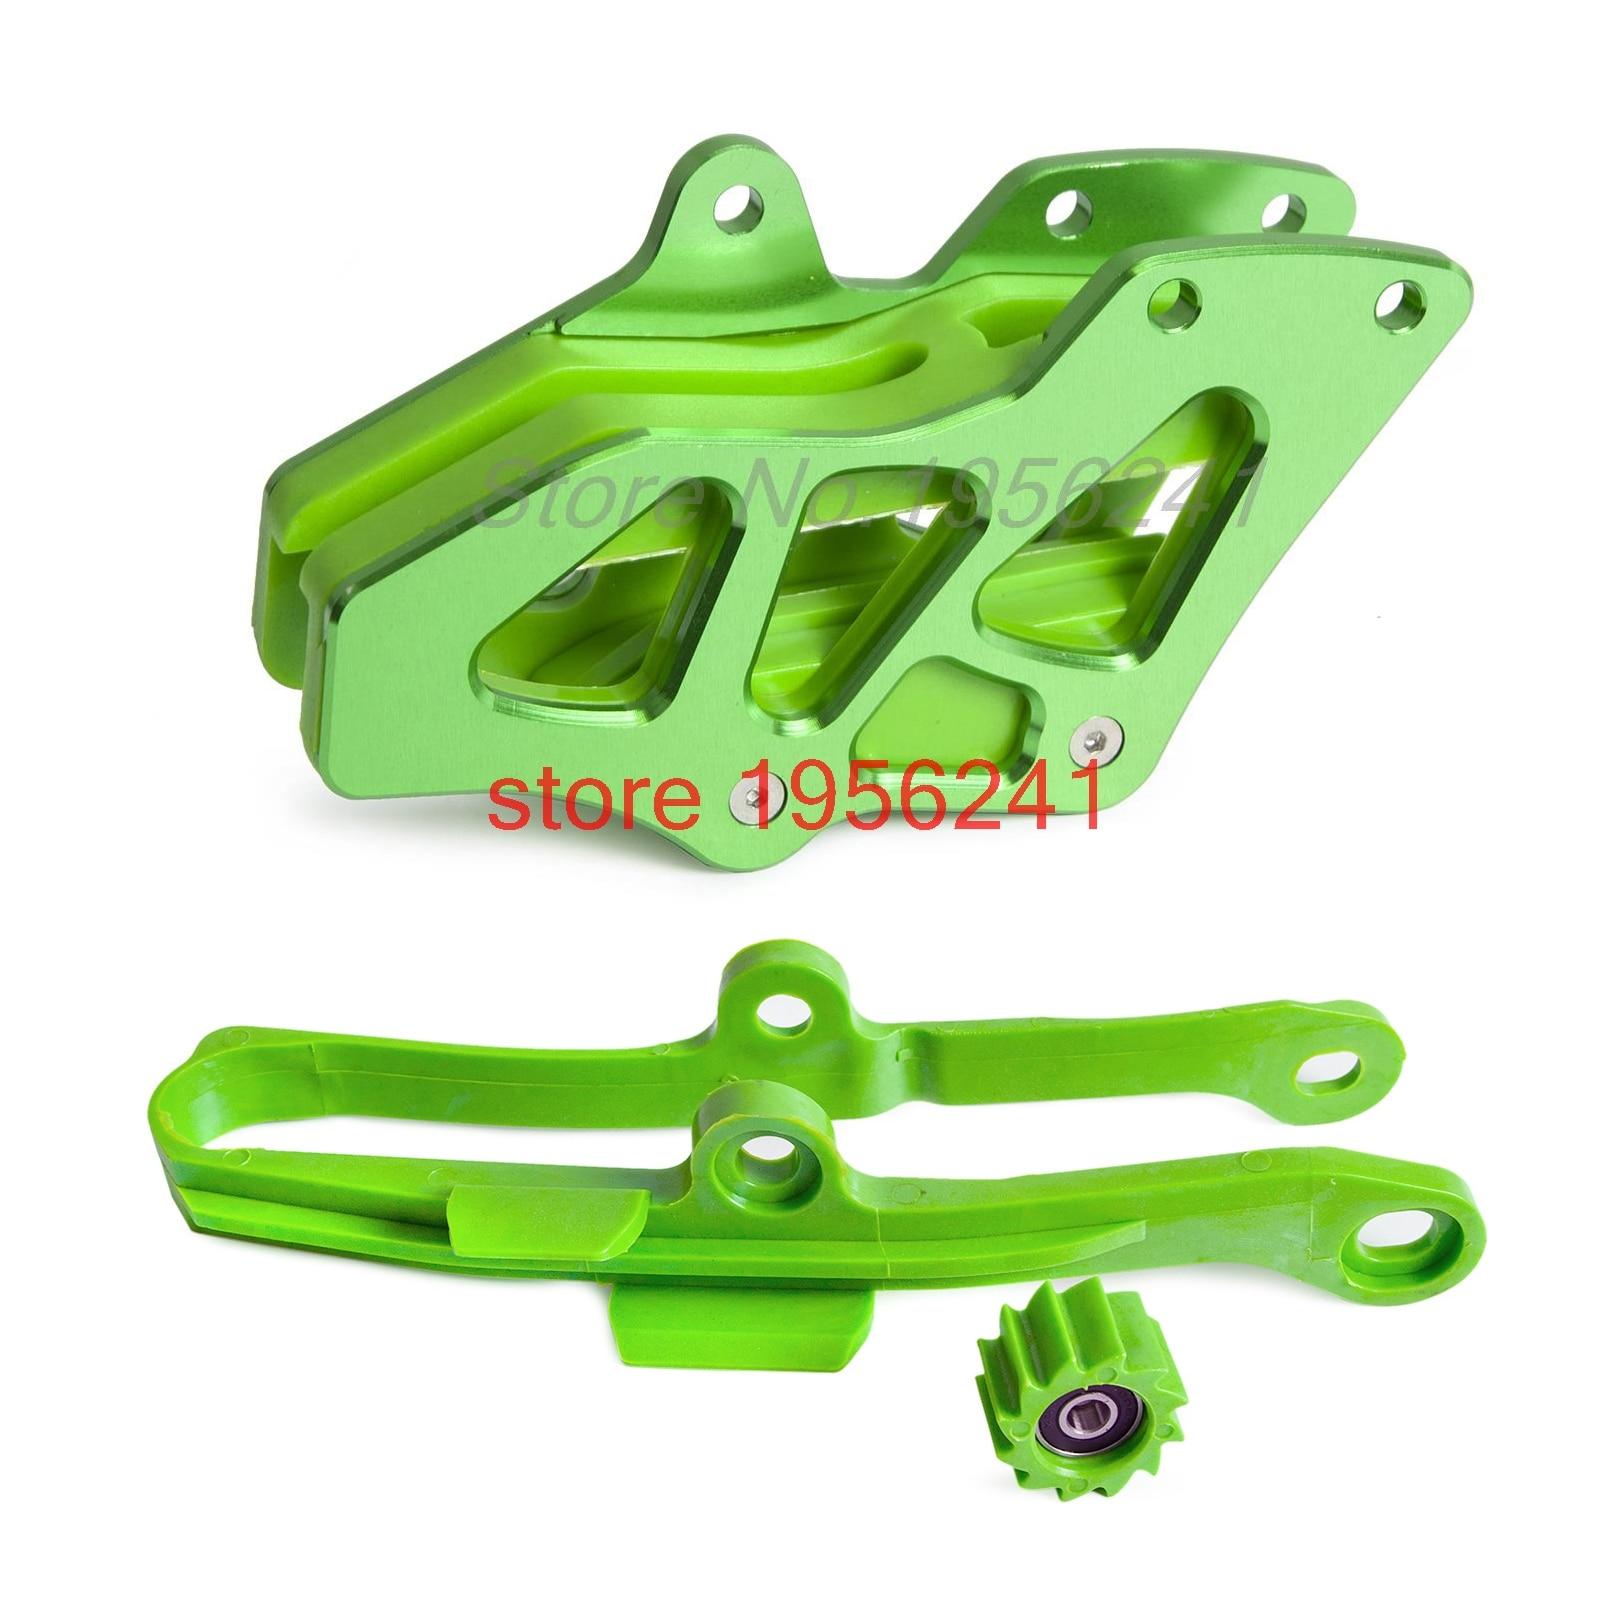 NICECNC cadena Swingarm cadena guía deslizante Protector de rodillo Kit para Kawasaki KX250F KX450F KXF250 KXF450 2009-2016 Durable